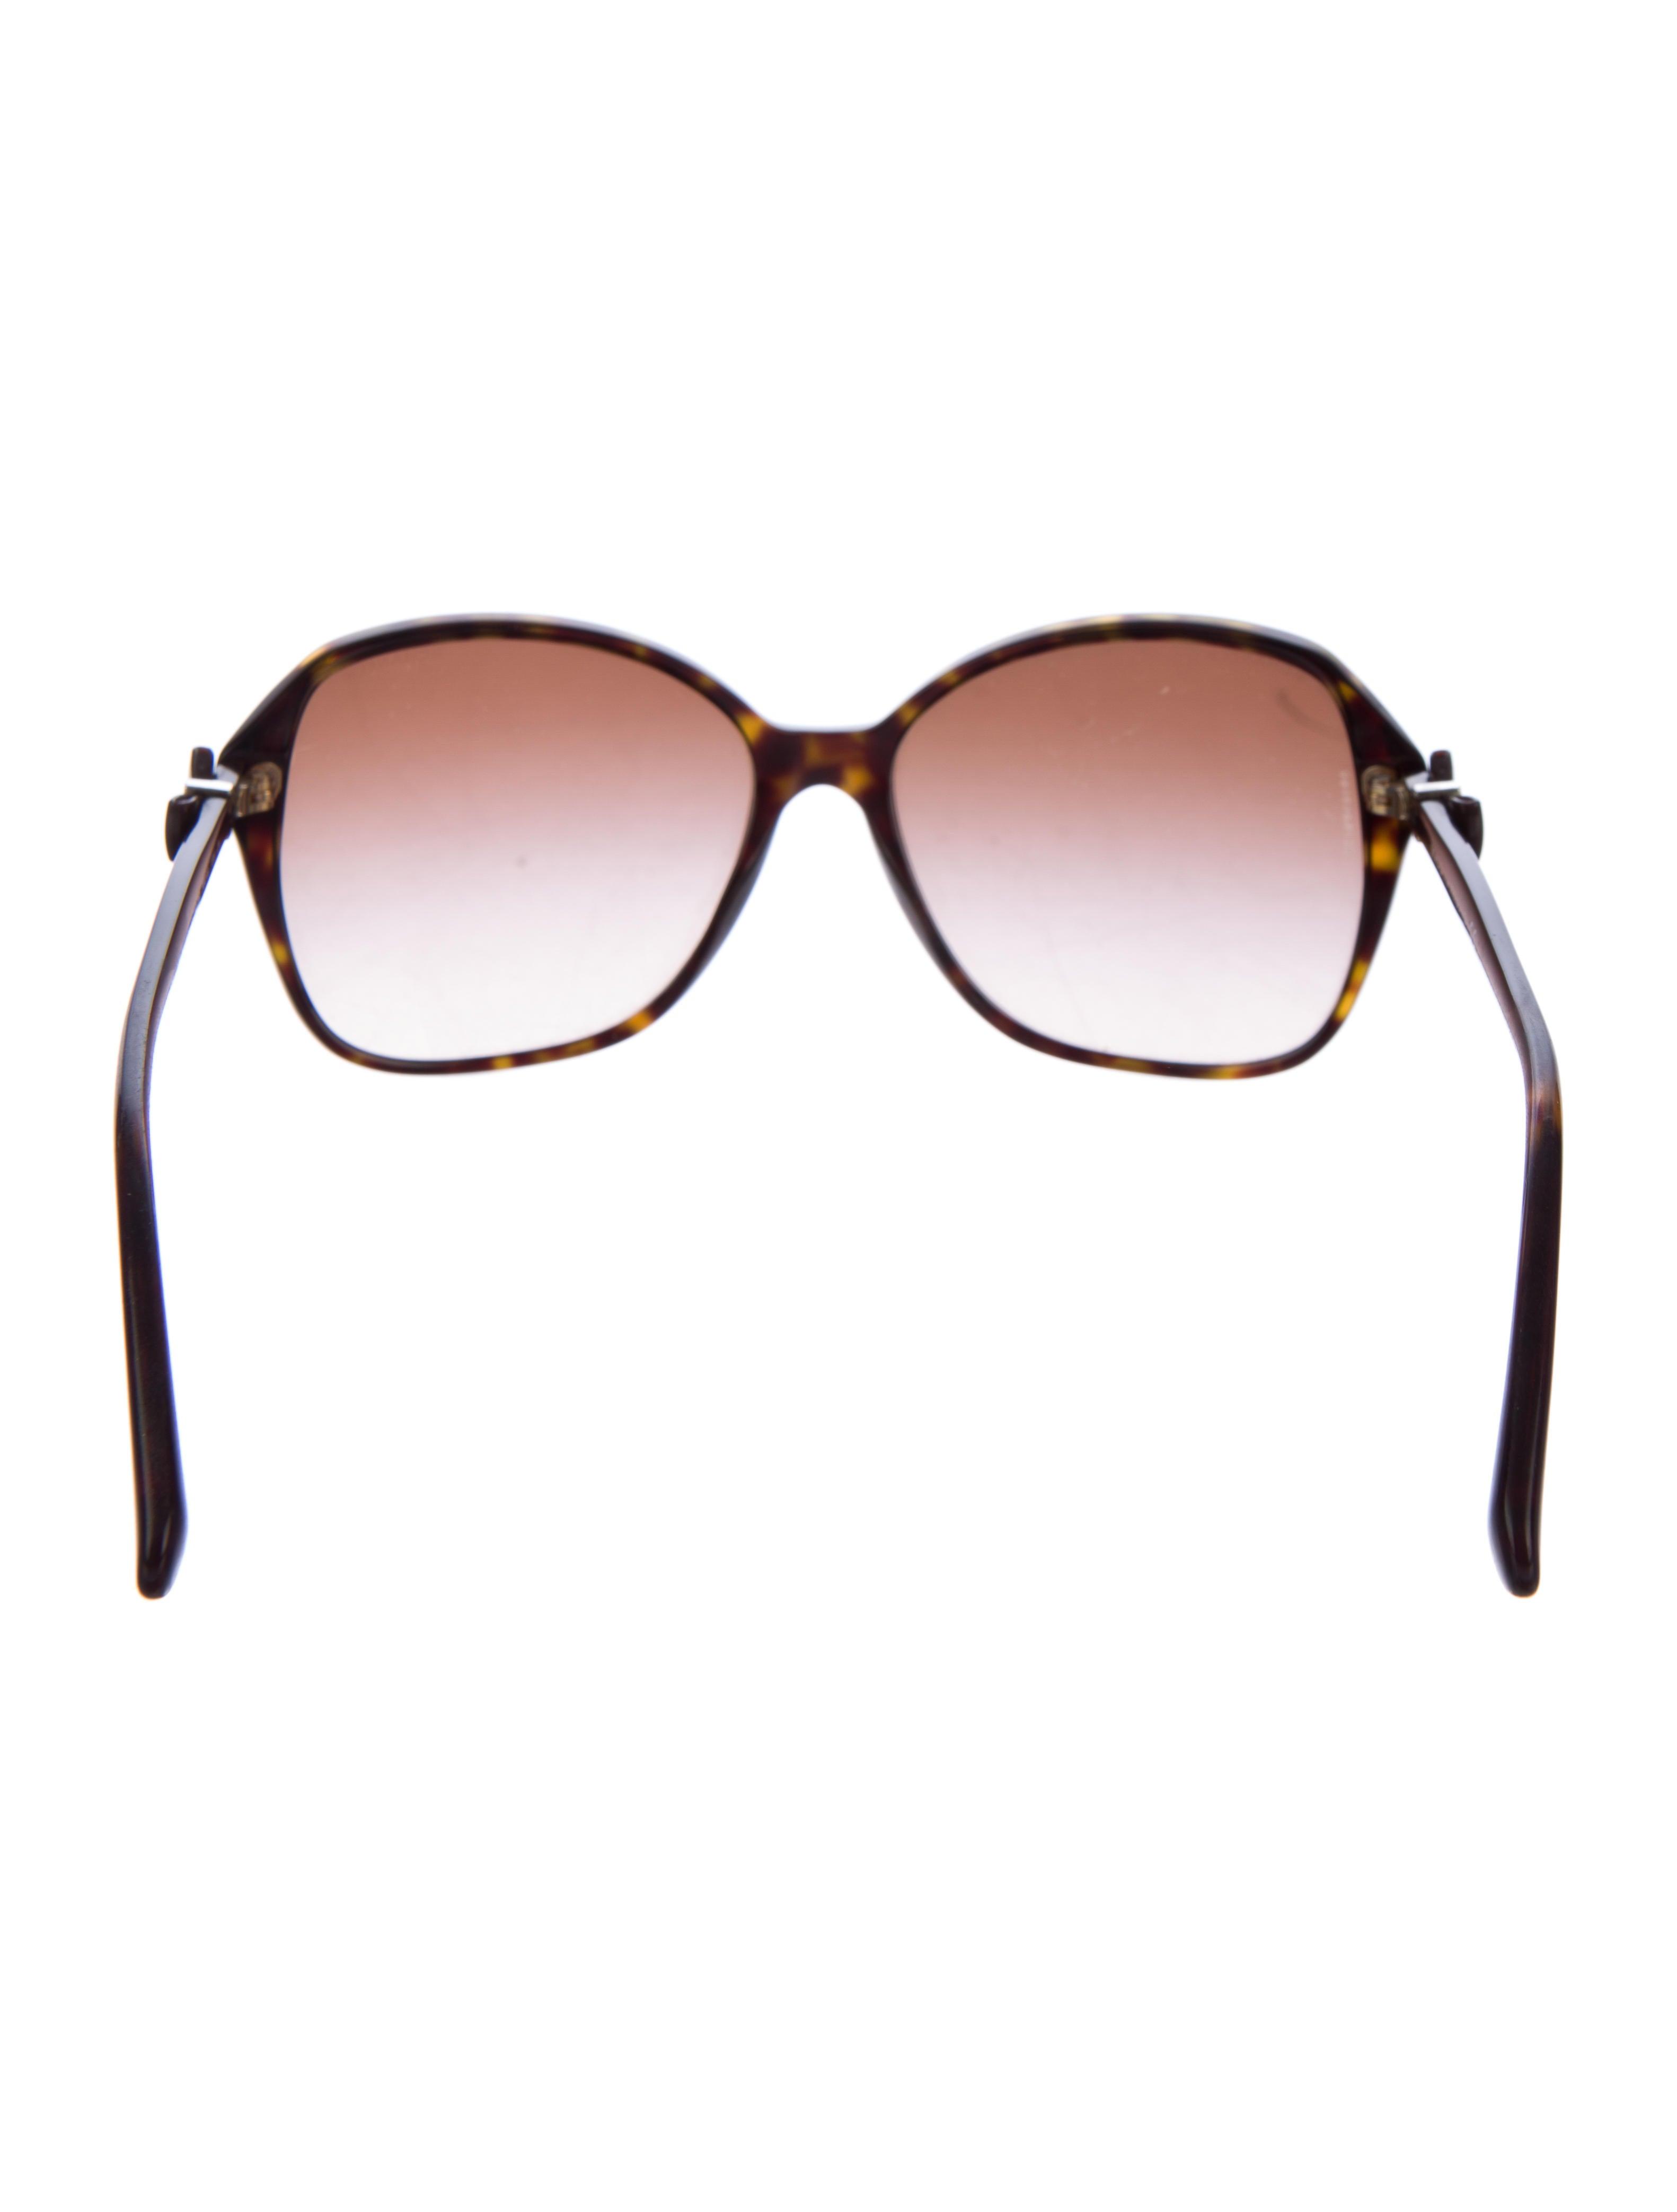 chanel bow tortoise sunglasses accessories cha125273